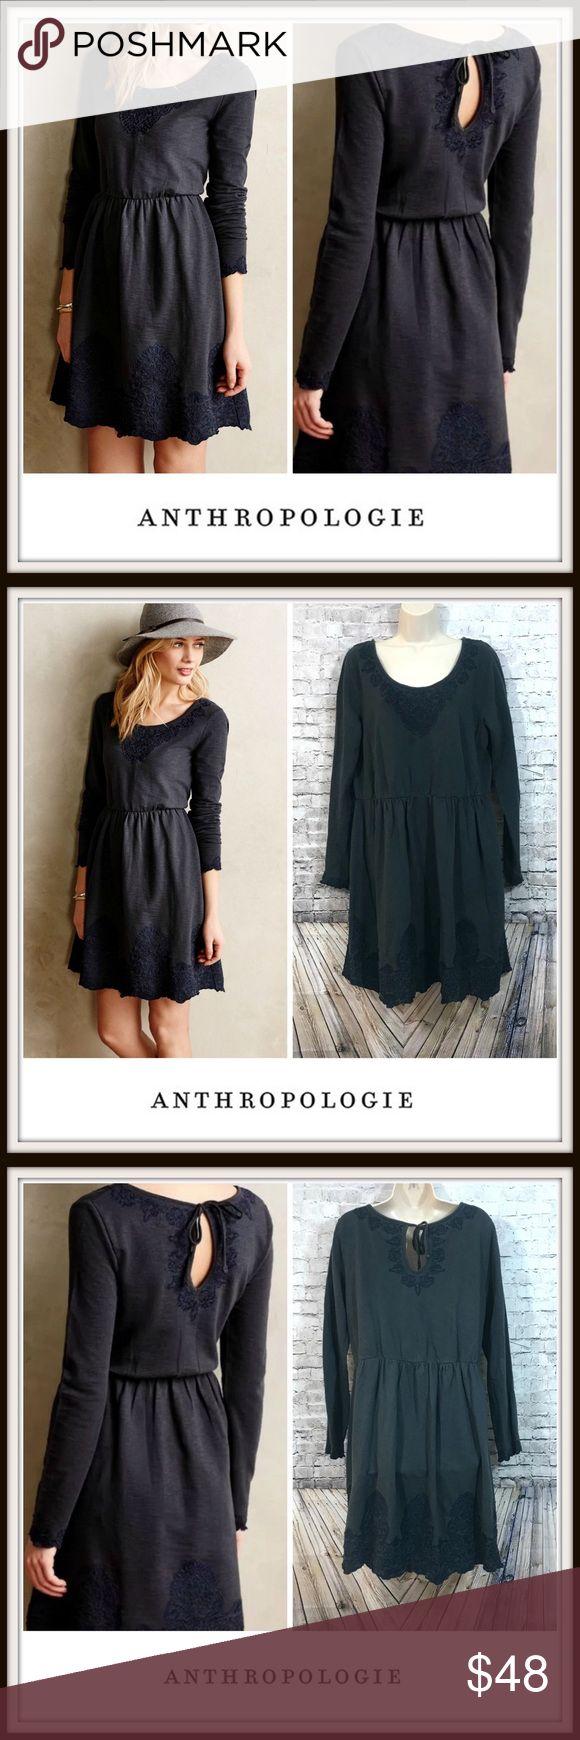 💋 Anthropologie Saturday Sunday Ellie Knit Dress Anthropologie Saturday Sunday Ellie Knit Dress | • Embroidered Hem & Sleeves | • Color: Gray/Blue | • Sz: XL Anthropologie Dresses